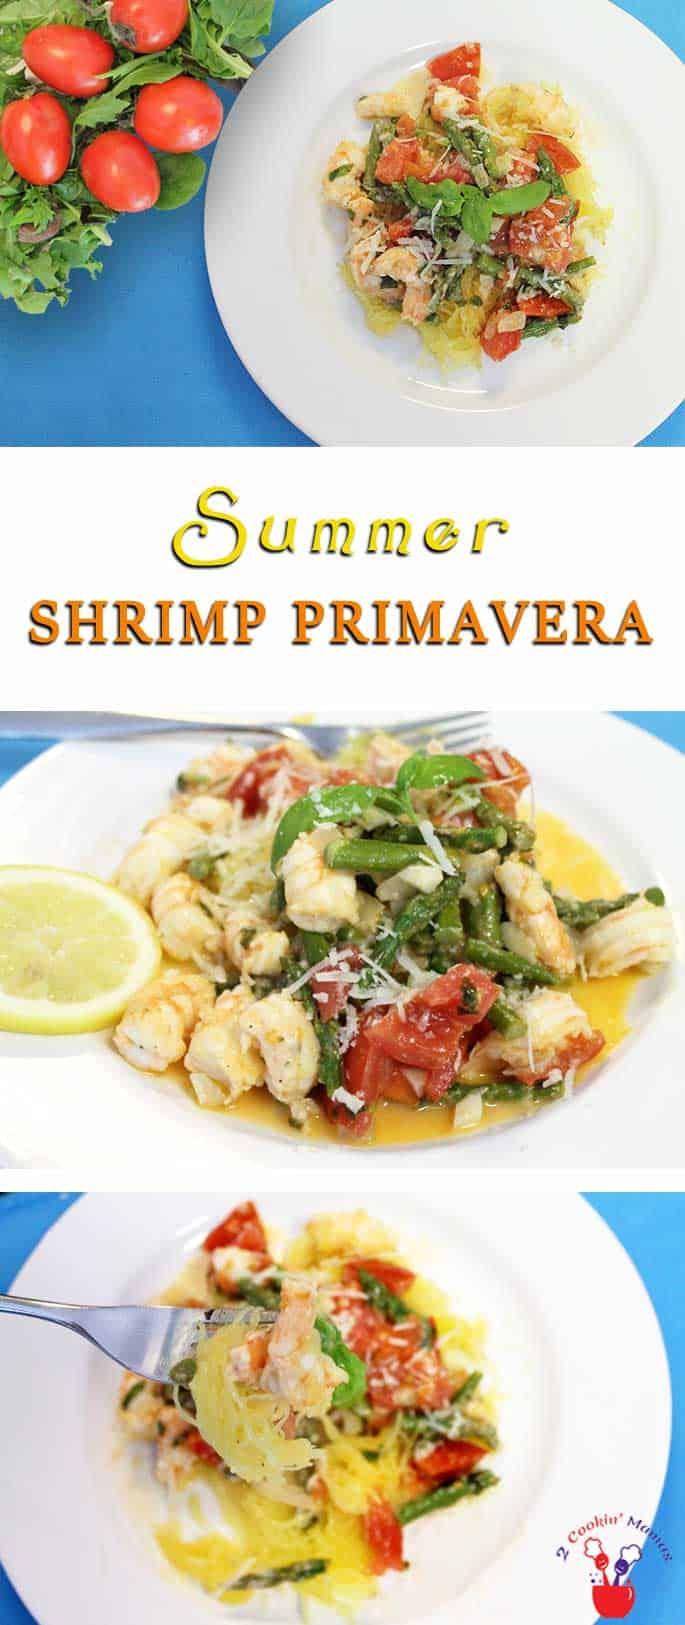 Summer Shrimp Primavera | 2 Cookin Mamas A light summertime dinner recipe! Summer Shrimp Primavera is full of seasonal vegetables & shrimp,tossed in lemon wine broth & served over spaghetti squash.